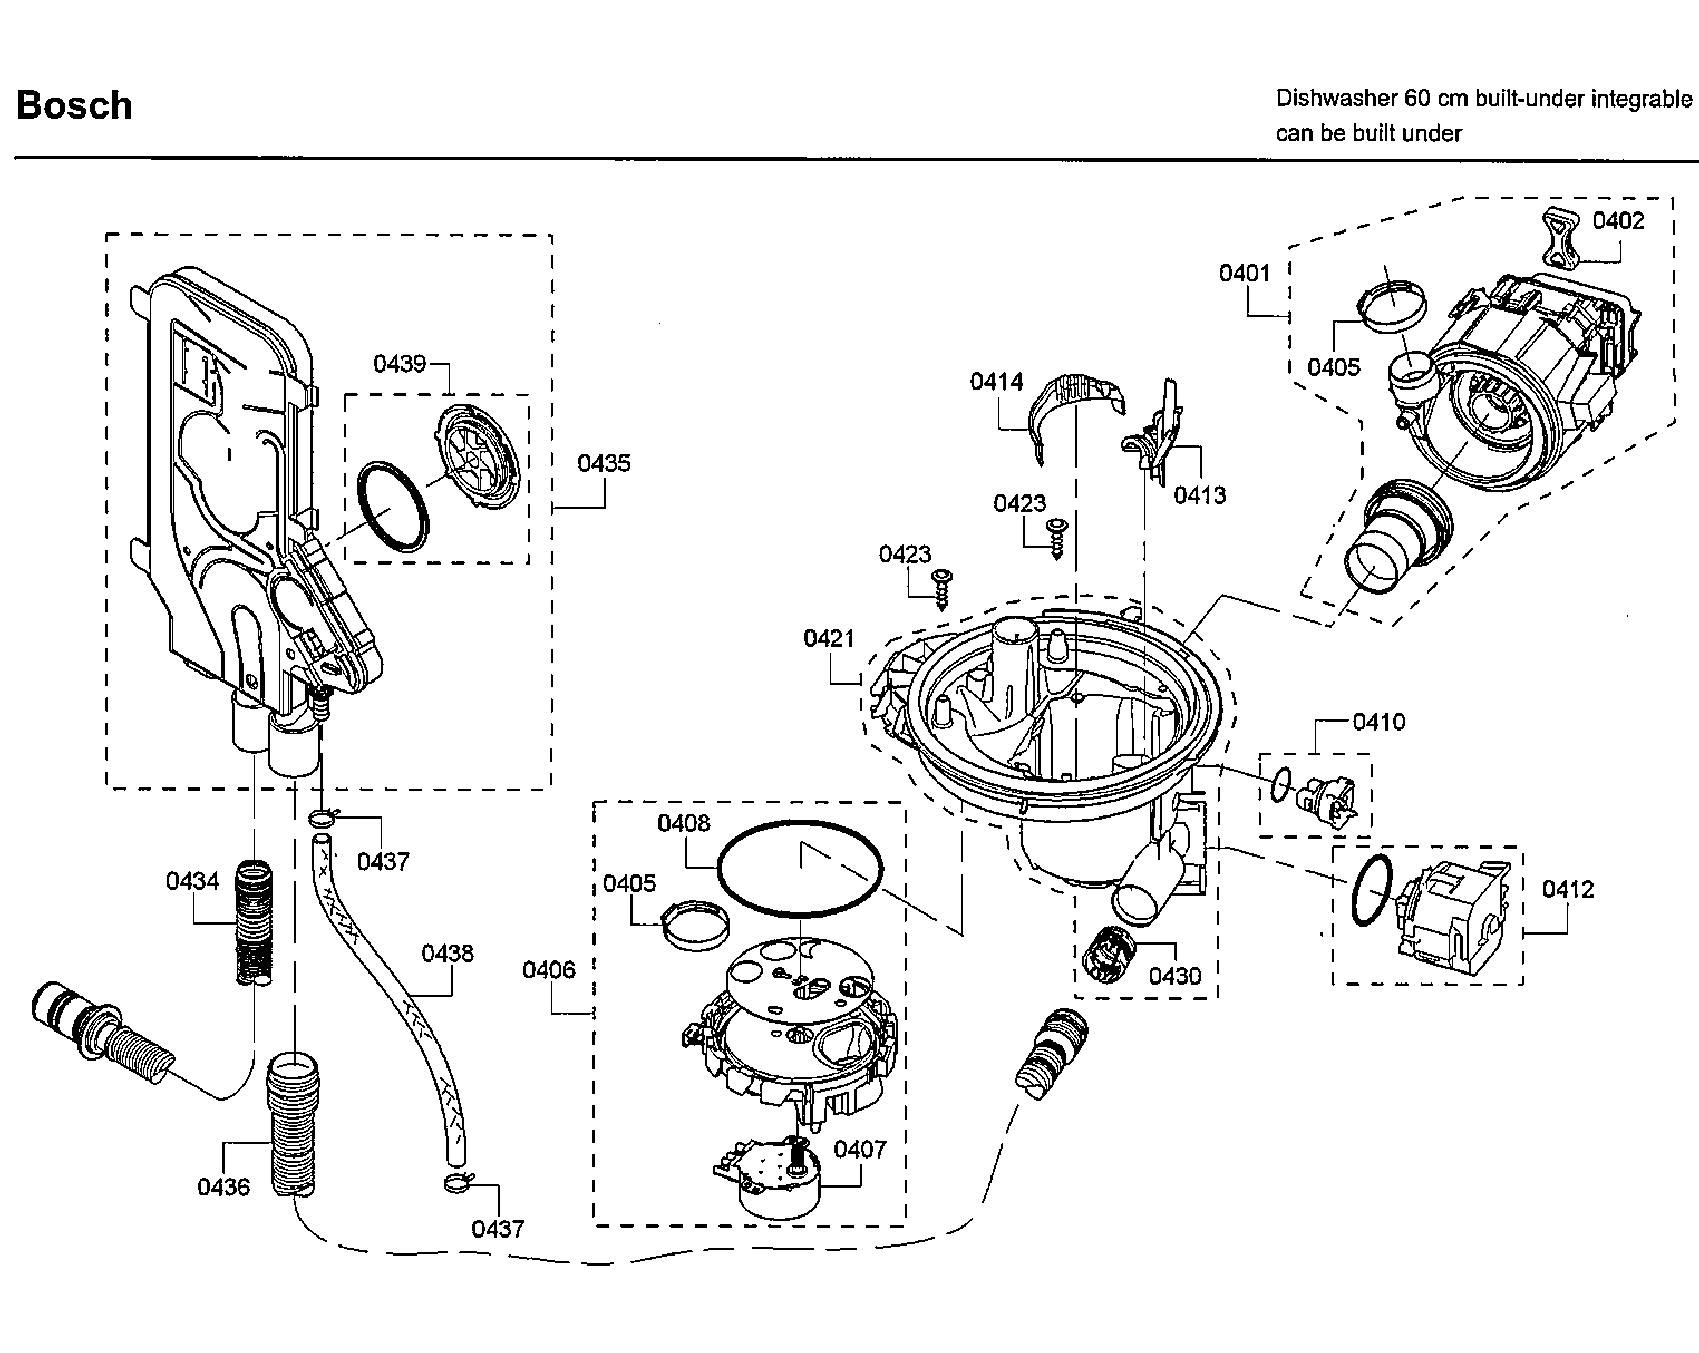 Bosch model SHP68T55UC/09 dishwasher genuine parts